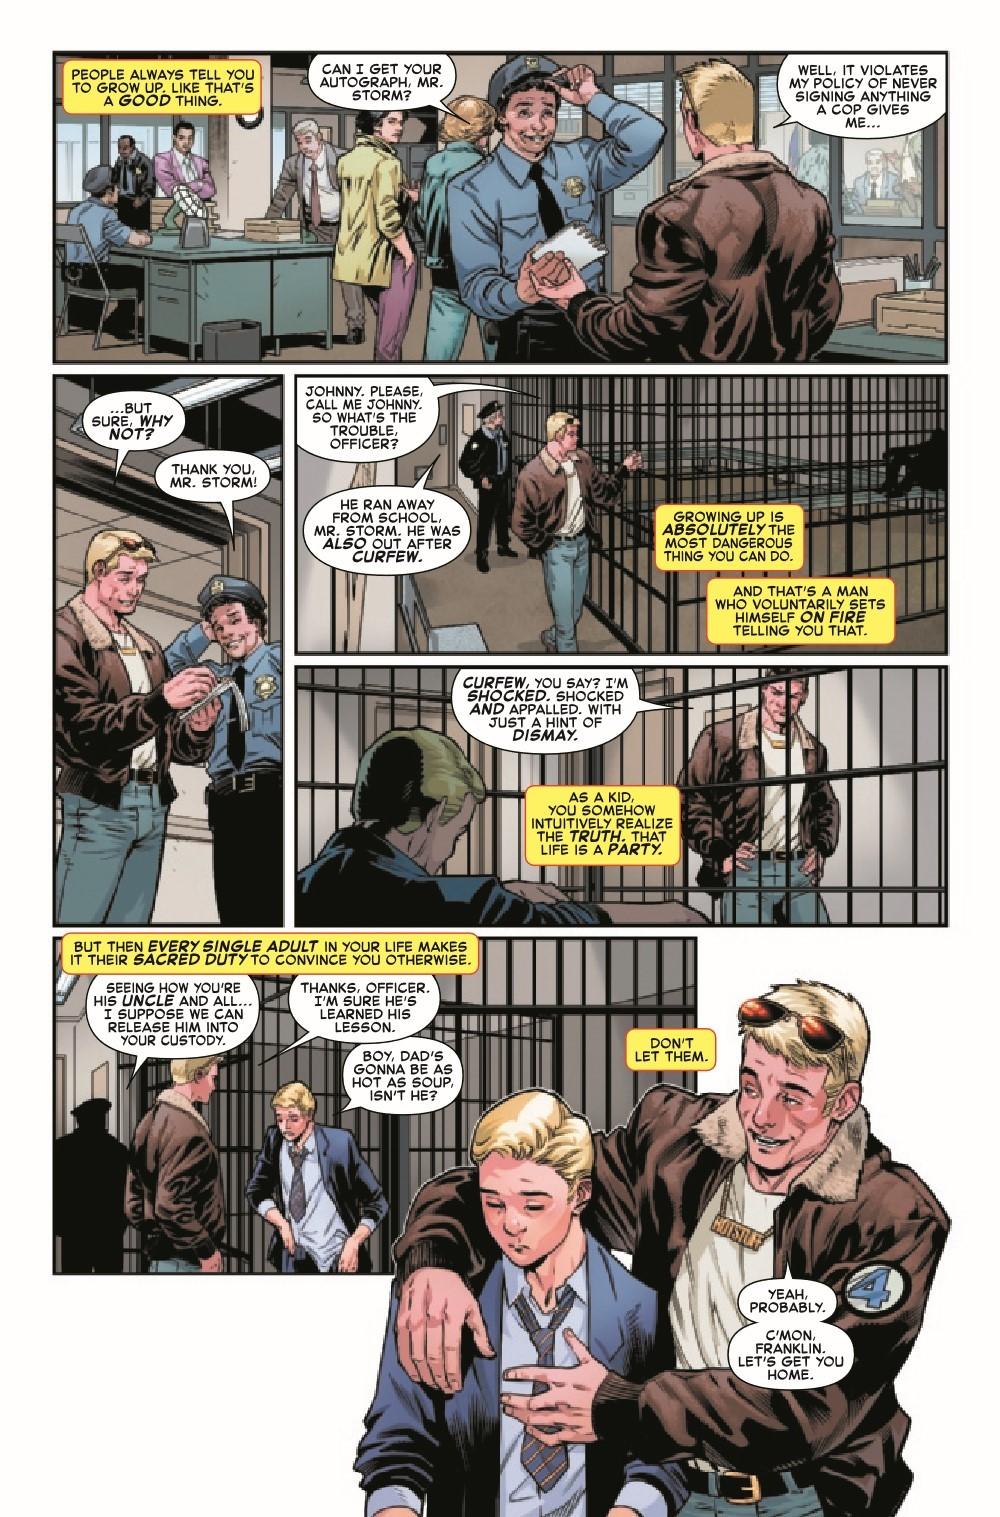 FFLIFESTORY2019003_Preview-3 ComicList Previews: FANTASTIC FOUR LIFE STORY #3 (OF 6)